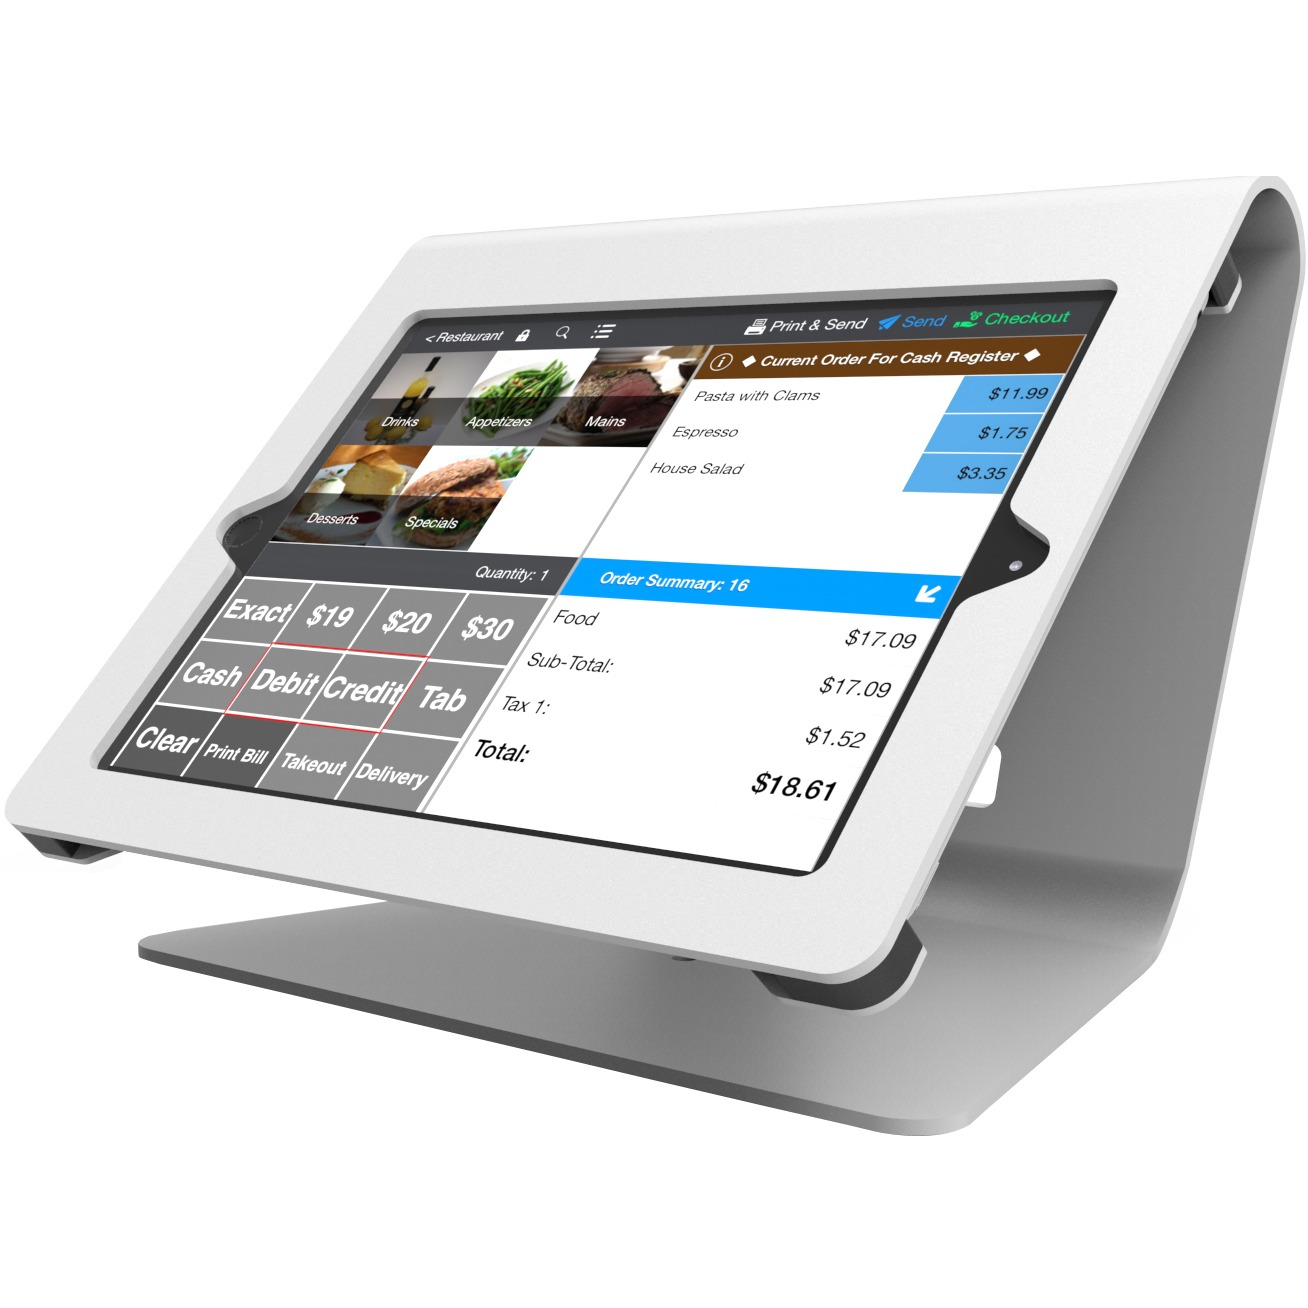 Compulocks Nollie iPad Kiosk - Nollie iPad POS Stand - White